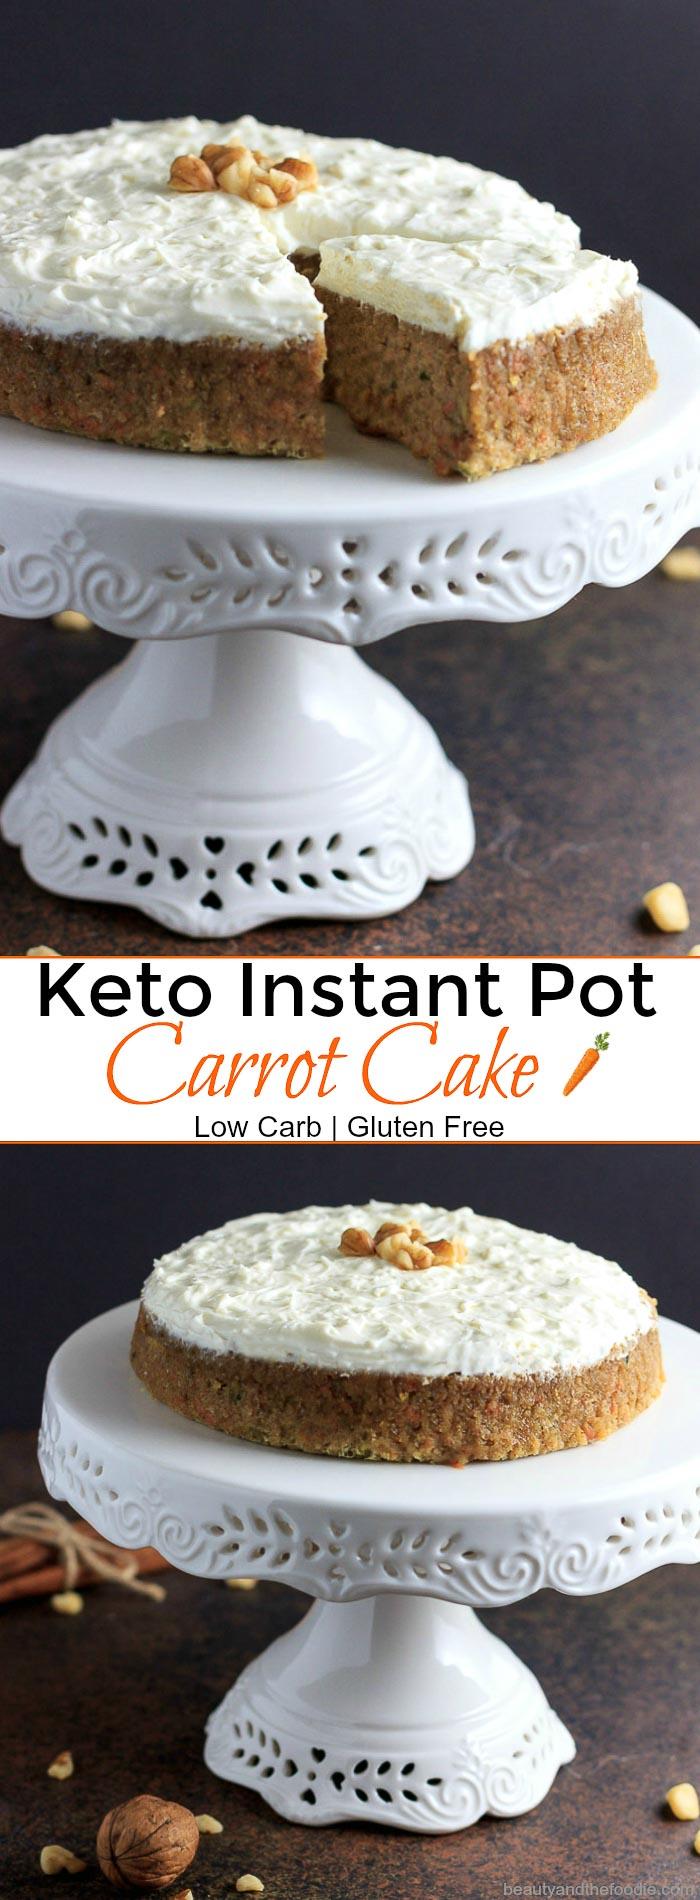 Keto Instant Pot Carrot Cake